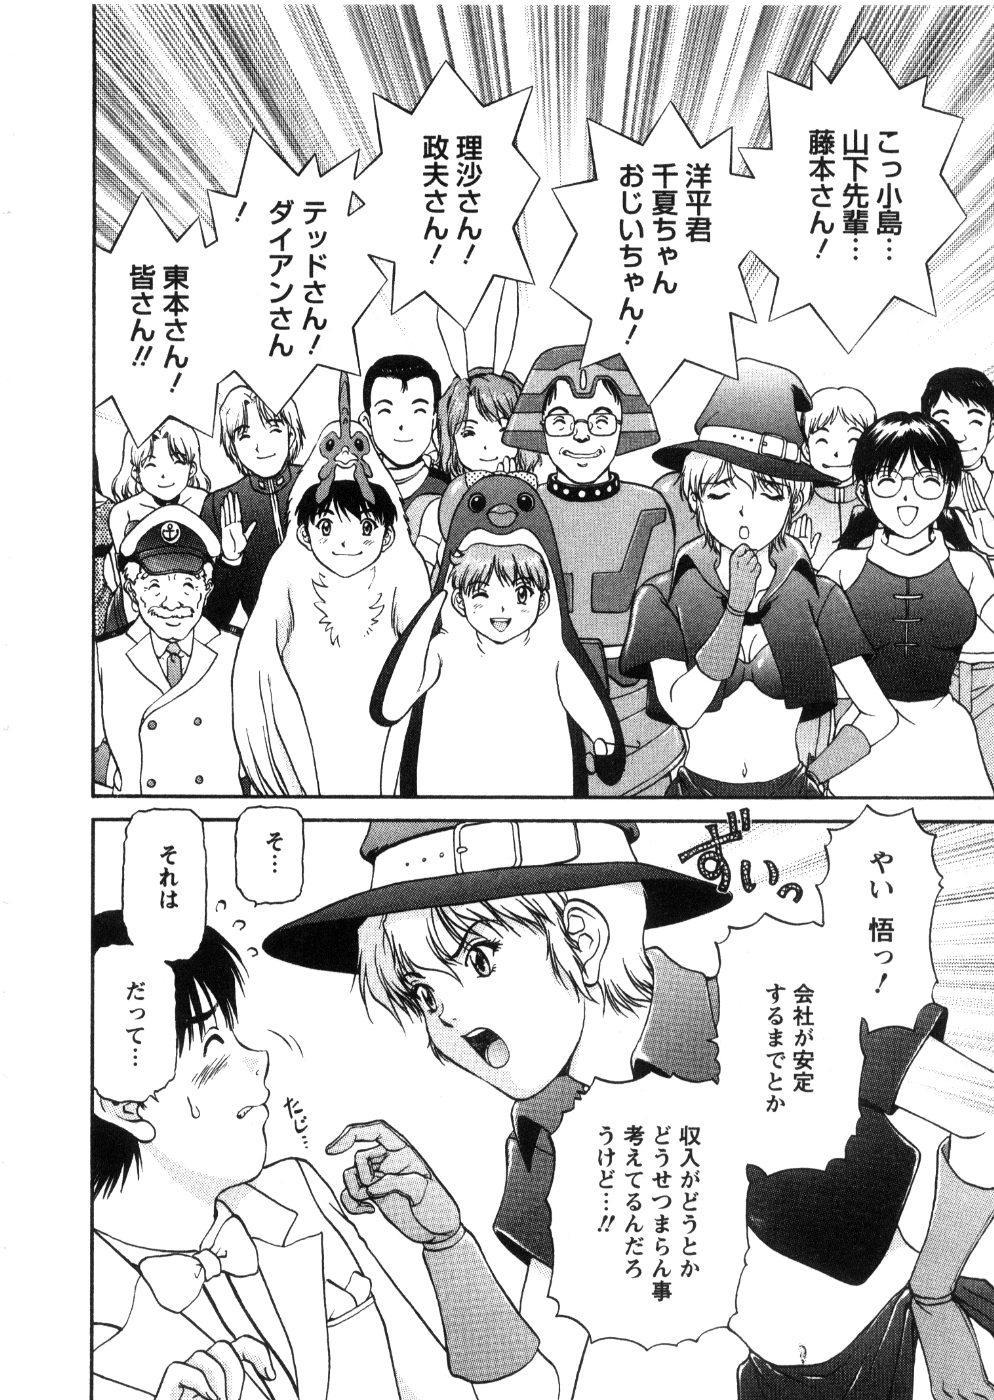 Oneechan-tachi ga Yatte Kuru 03 181